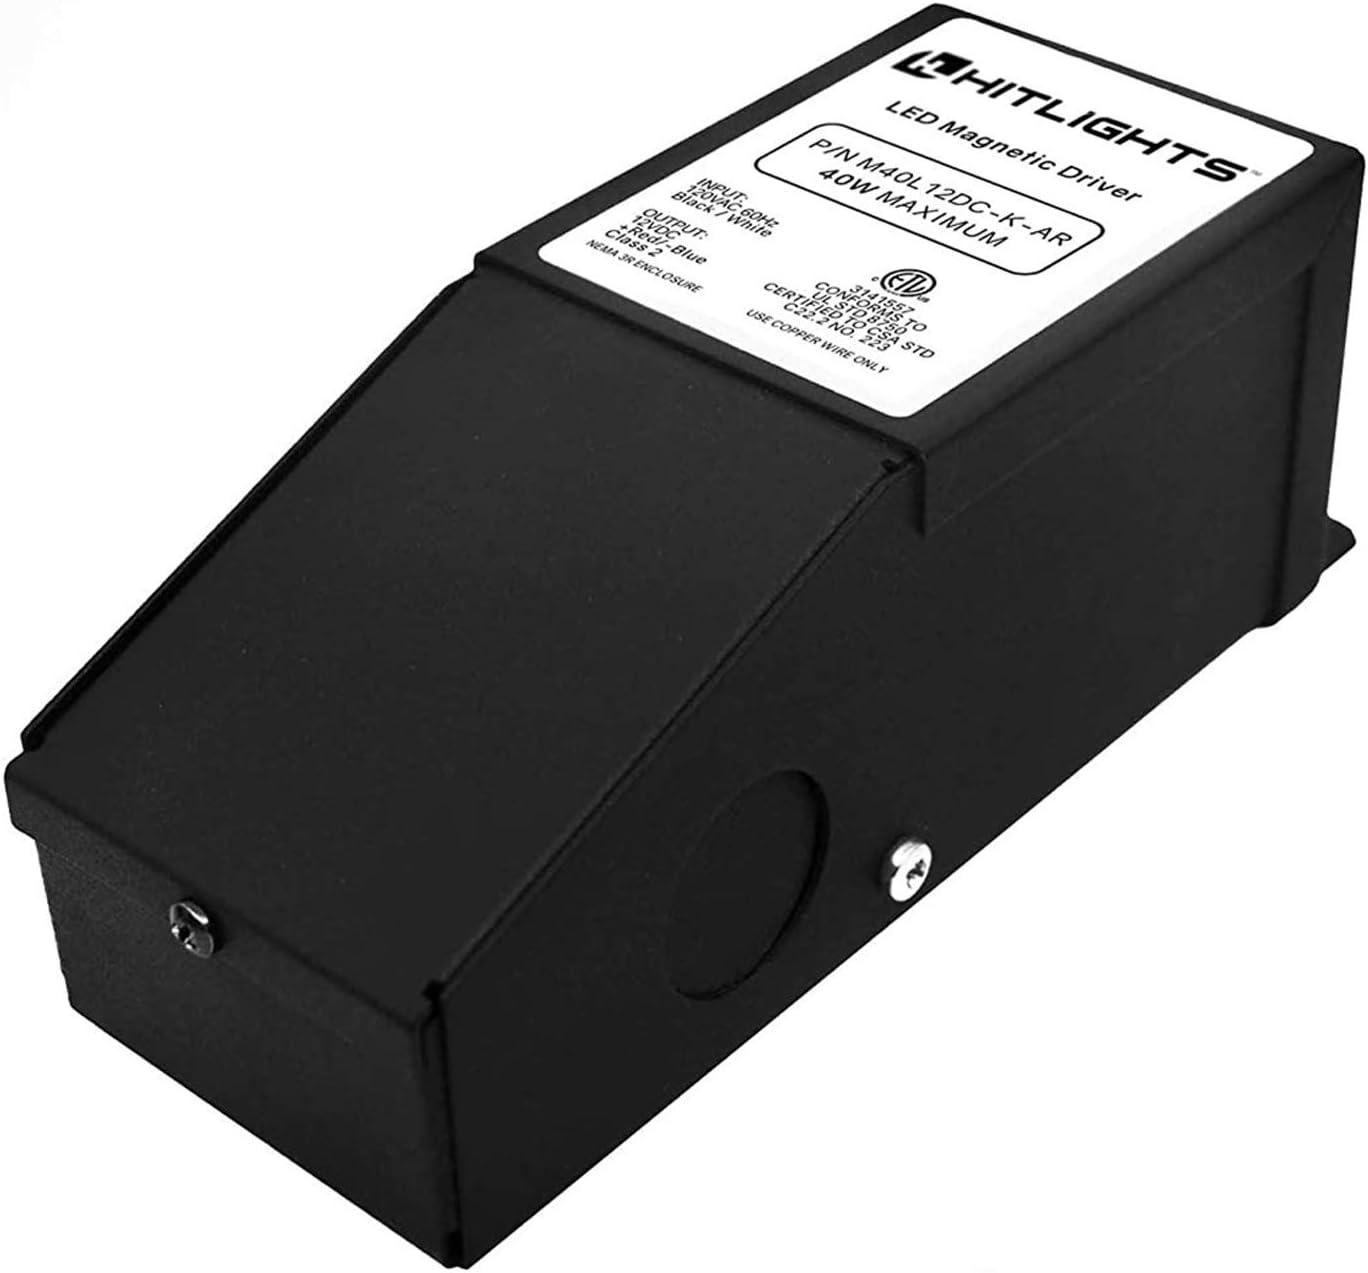 HITLIGHTS40 와트 디 밍이 가능한 LED 드라이버 12V 자기 전원 공급 장치-110V AC-12V DC LED 변압기. LED 지구 빛 일정한 전압 LED 제품을 위한 LUTRON 그리고 LEVITON 와 호환이 되는